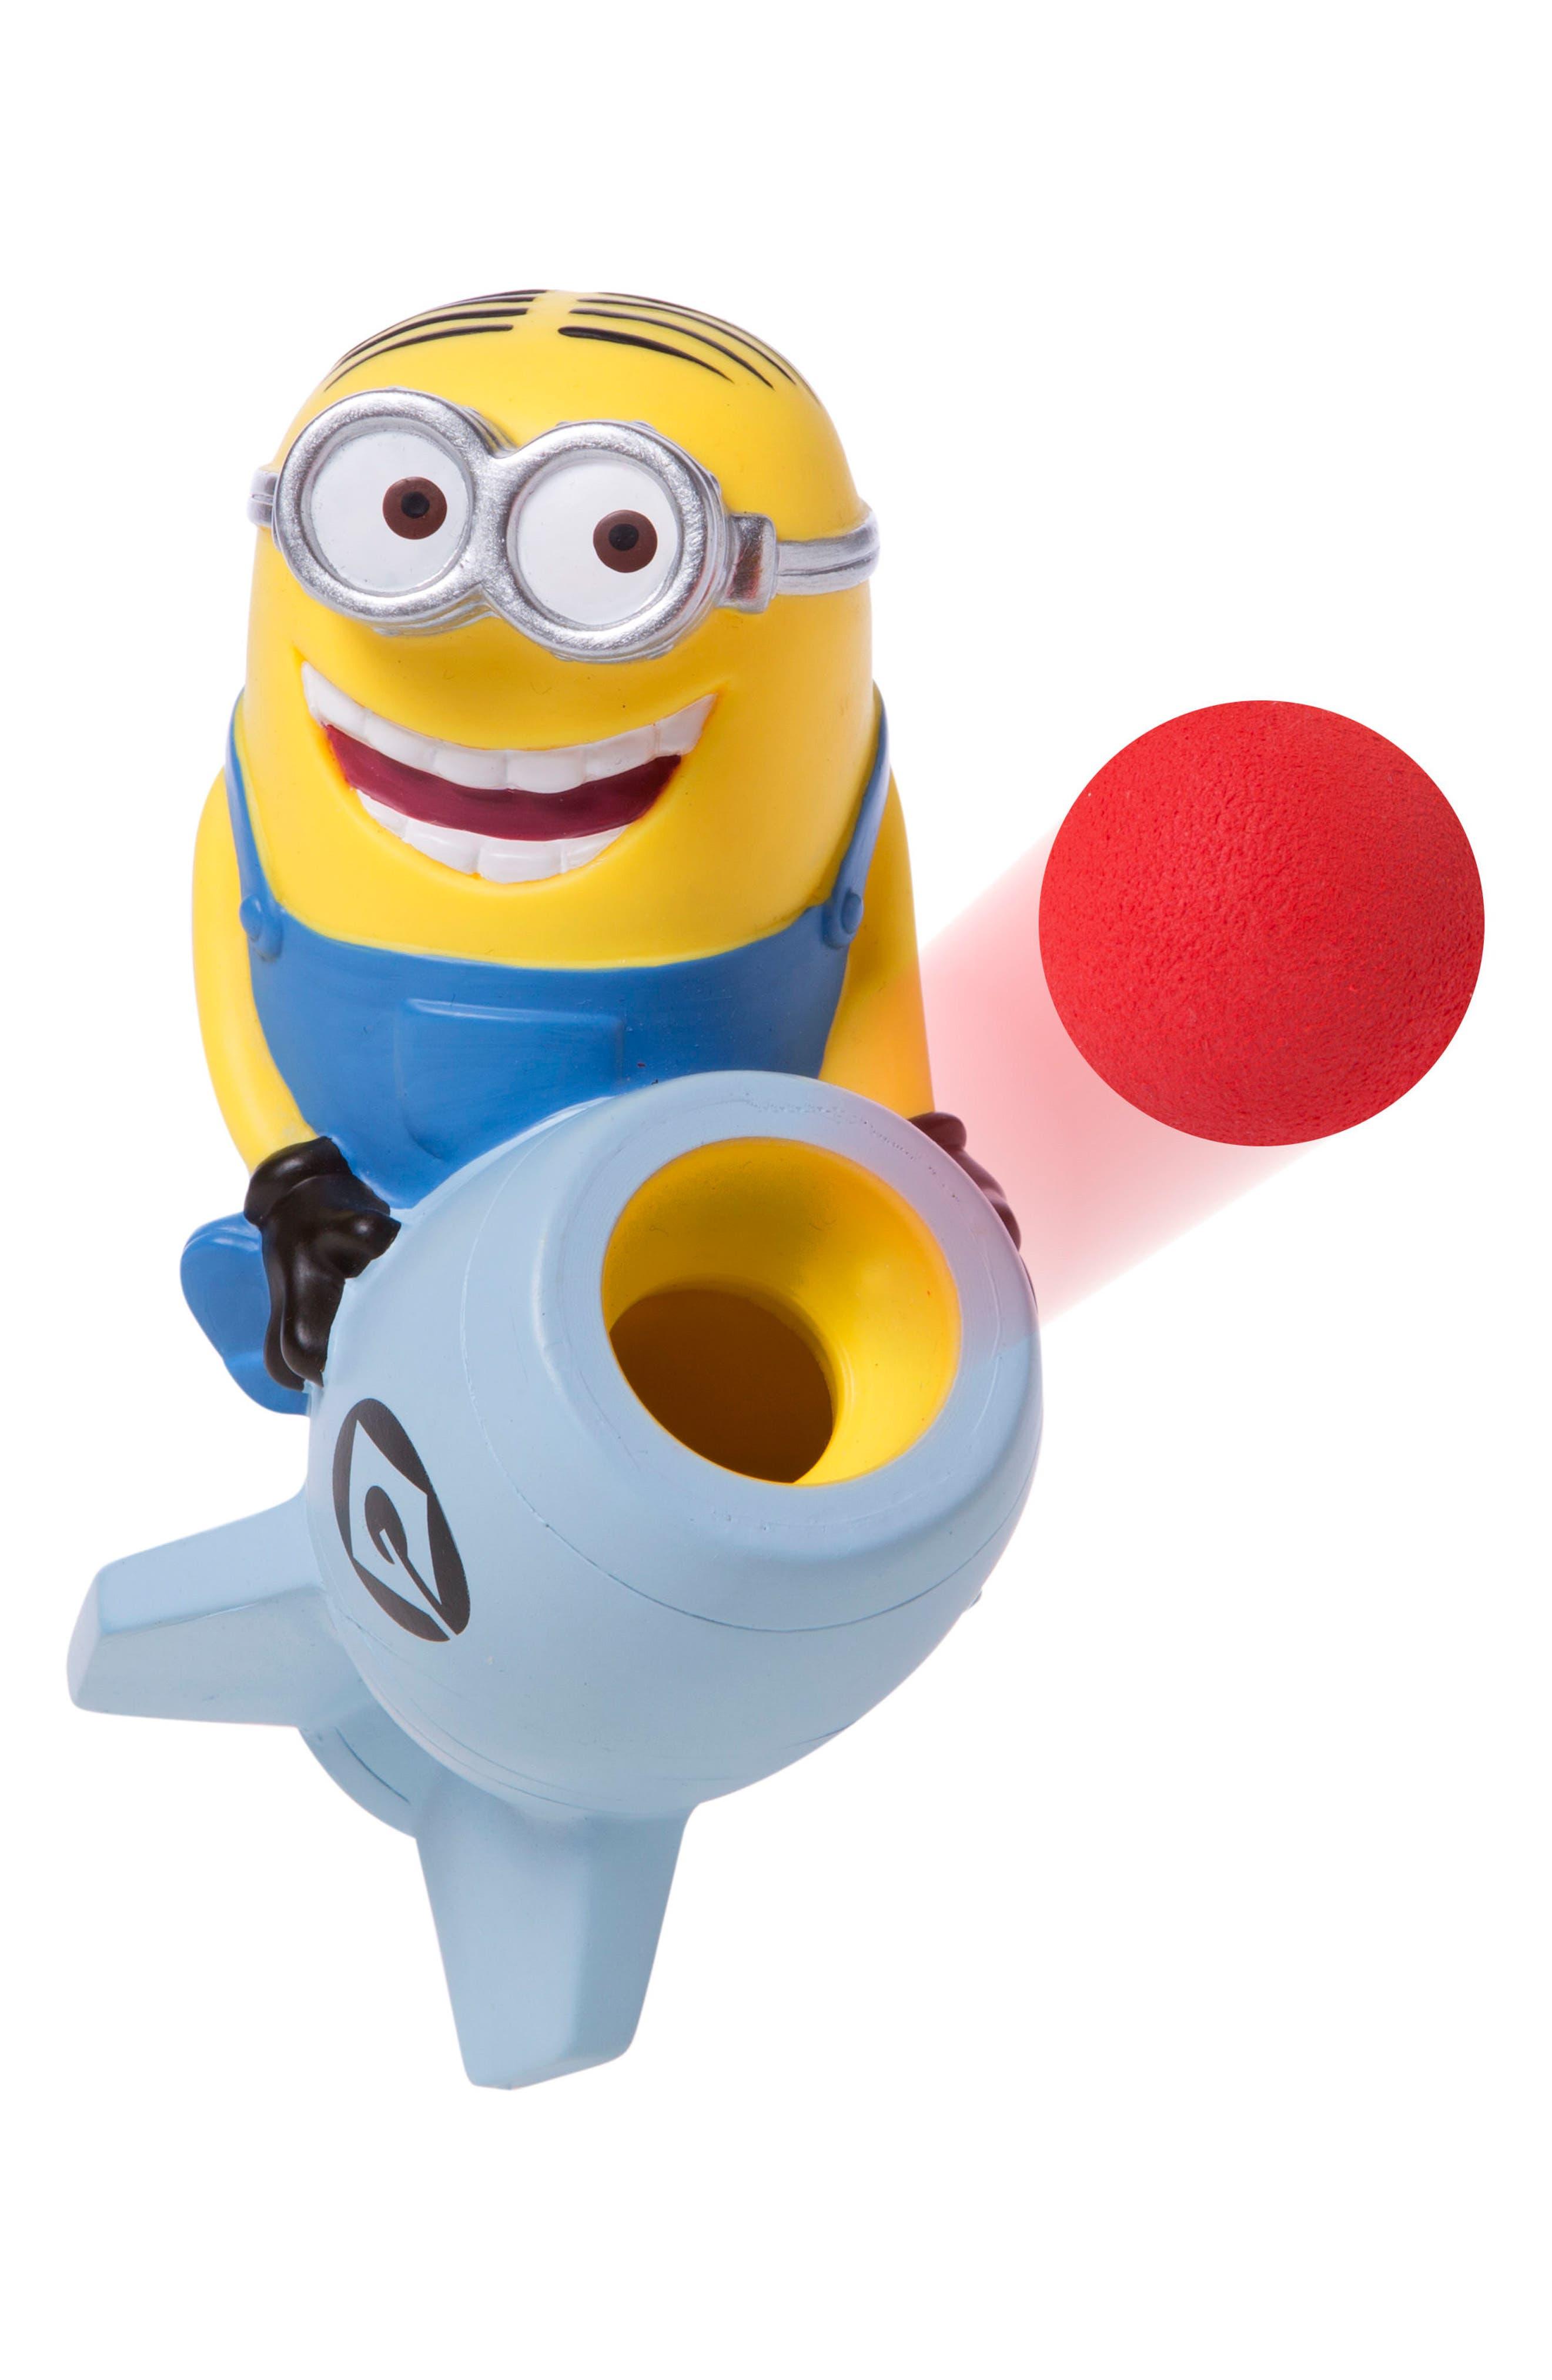 Main Image - Hog Wild Toys Dave Minion Popper Toy